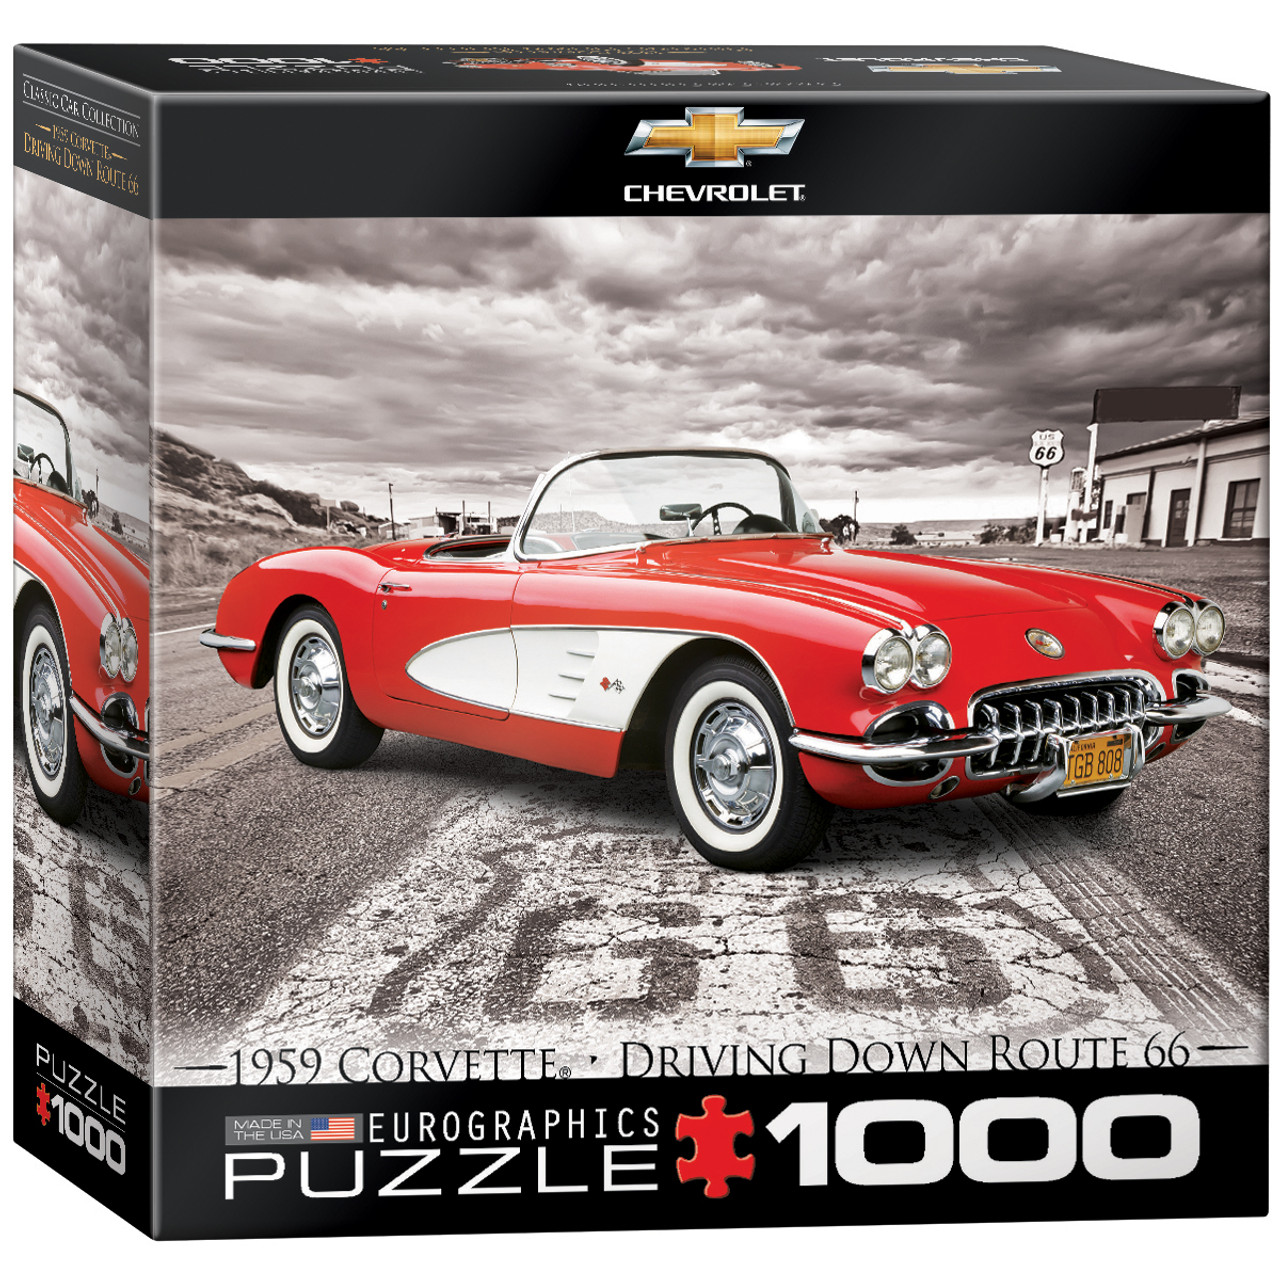 Eurographics 1959 Corvette (Small Box) Jigsaw Puzzle ... 057dc574fa72f